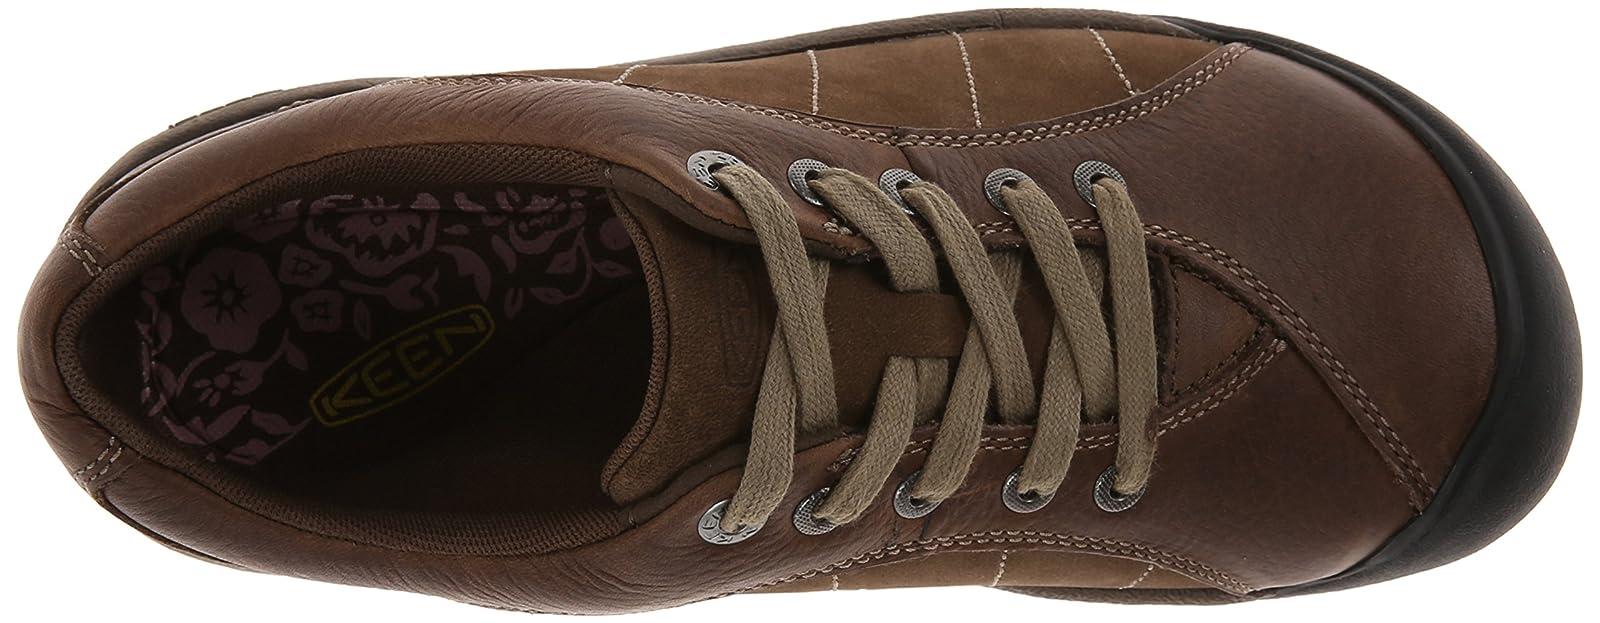 KEEN Women's Presidio Shoe Cascade Brown/Shitake 9.5 M US Women - 8